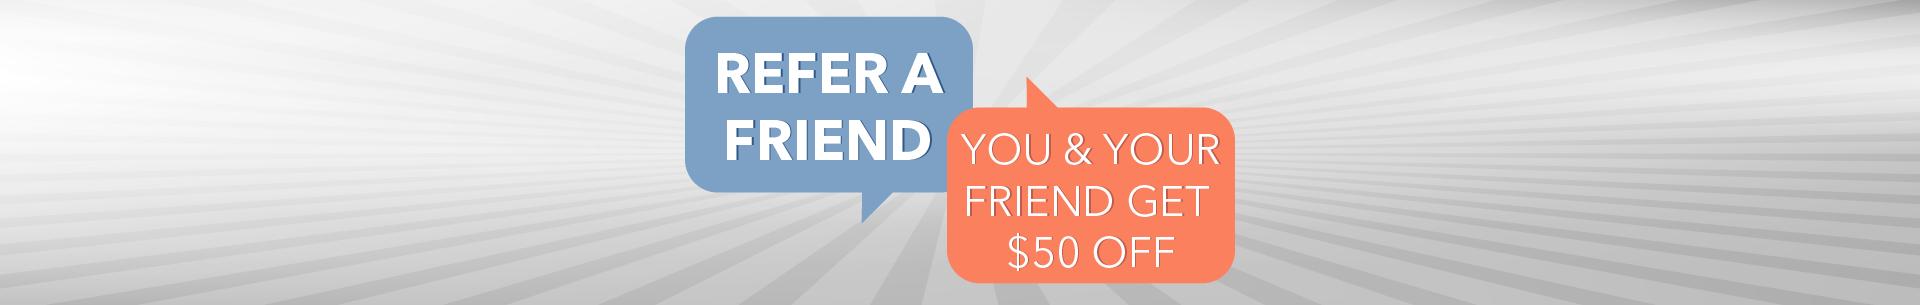 refer a friend header graphic 1920 x 300